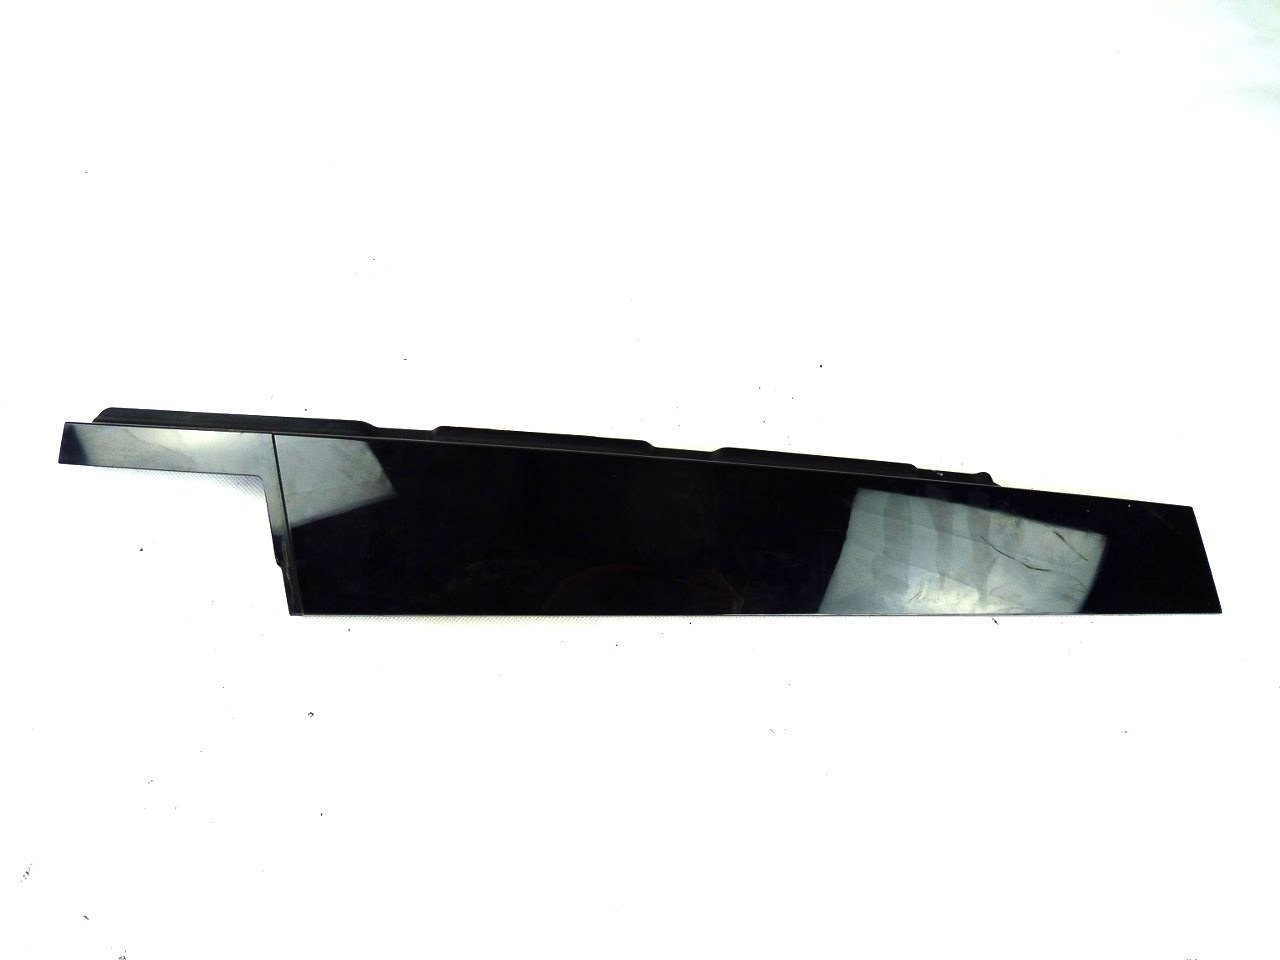 Strange Trim For Door Window Frame Left Vw Touareg Iii 18 760837901 Pabps2019 Chair Design Images Pabps2019Com